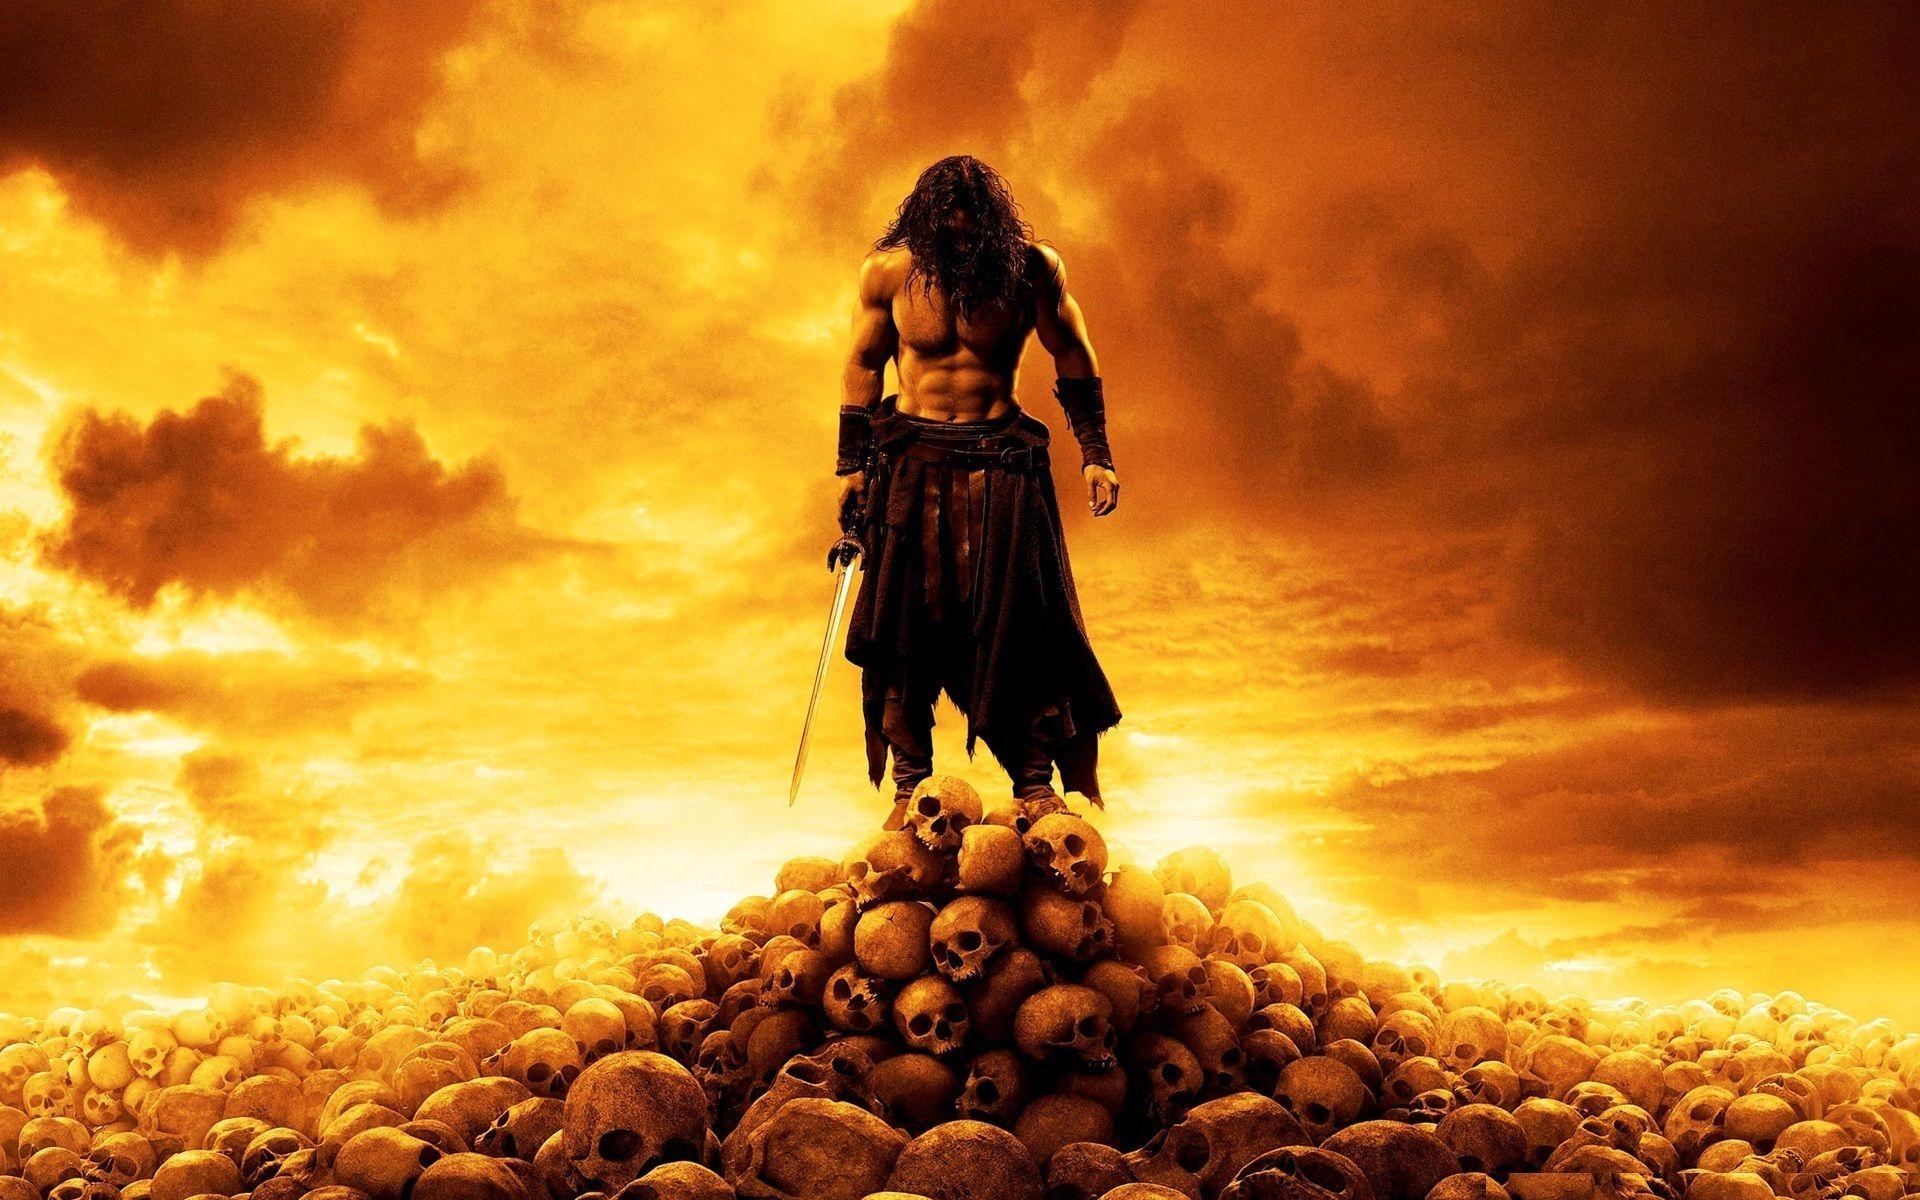 26 Conan The Barbarian 2011 Hd Wallpapers Backgrounds En